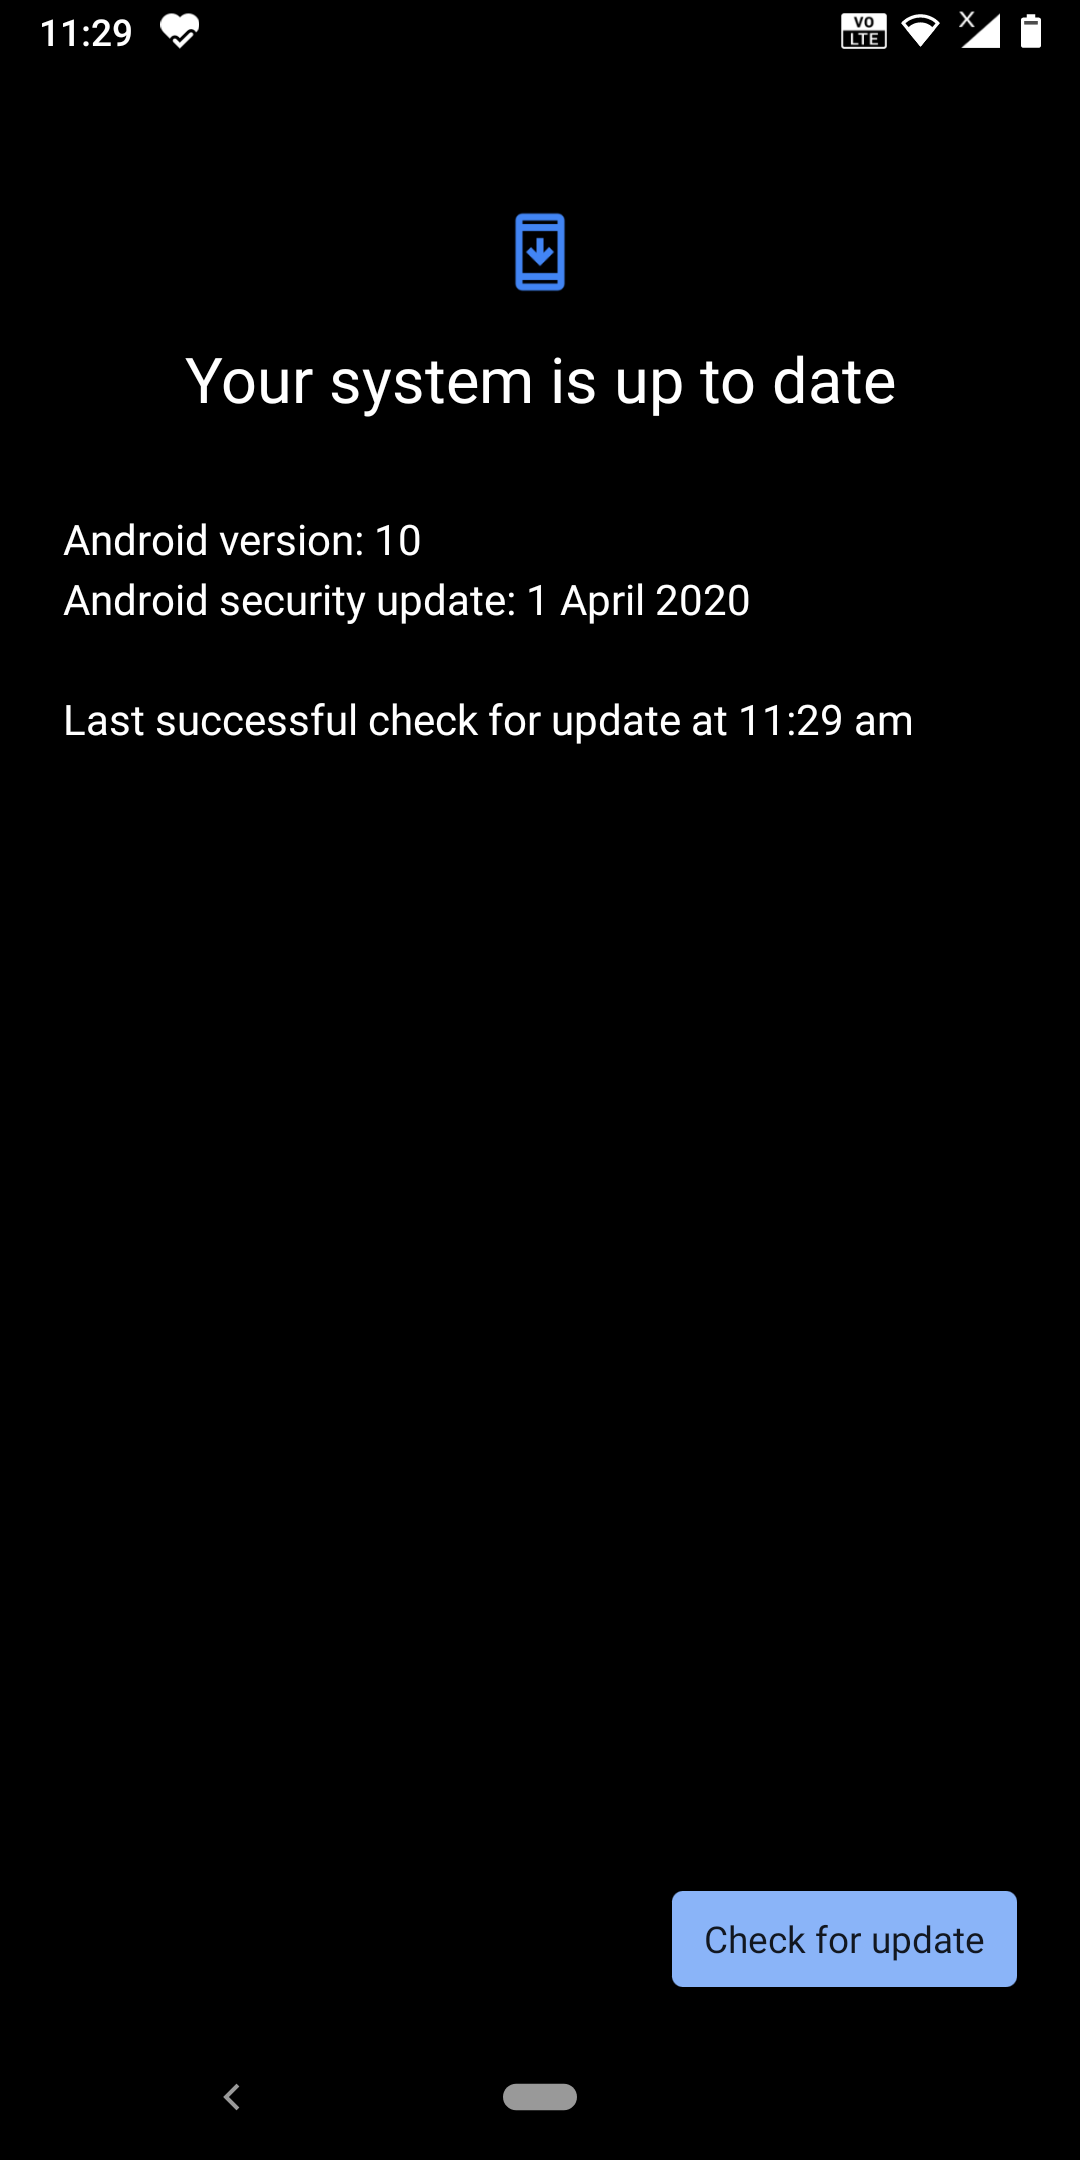 Screenshot_20200530-112941.png